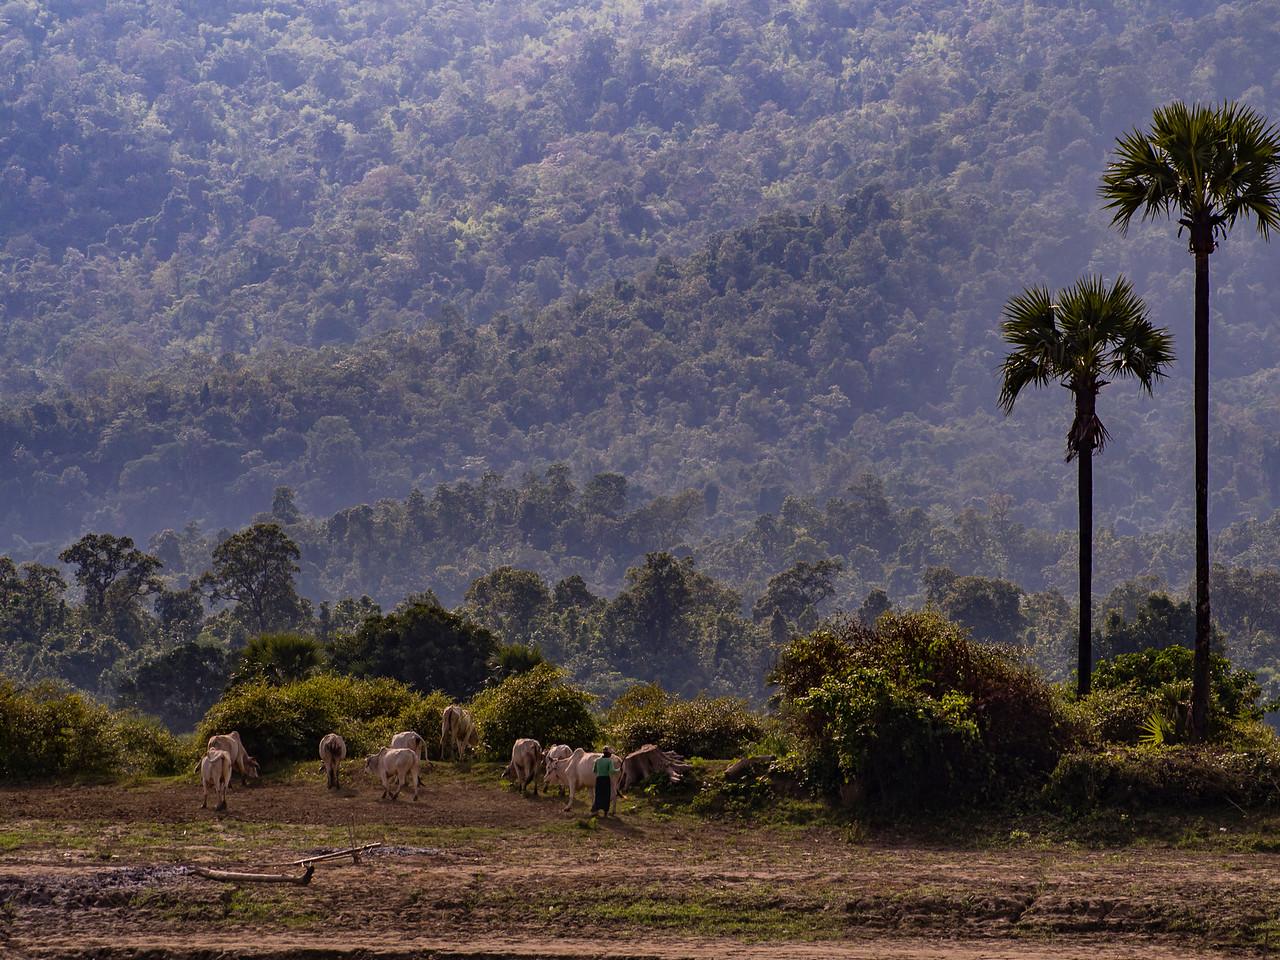 Views along the Chindwin River, Myanmar